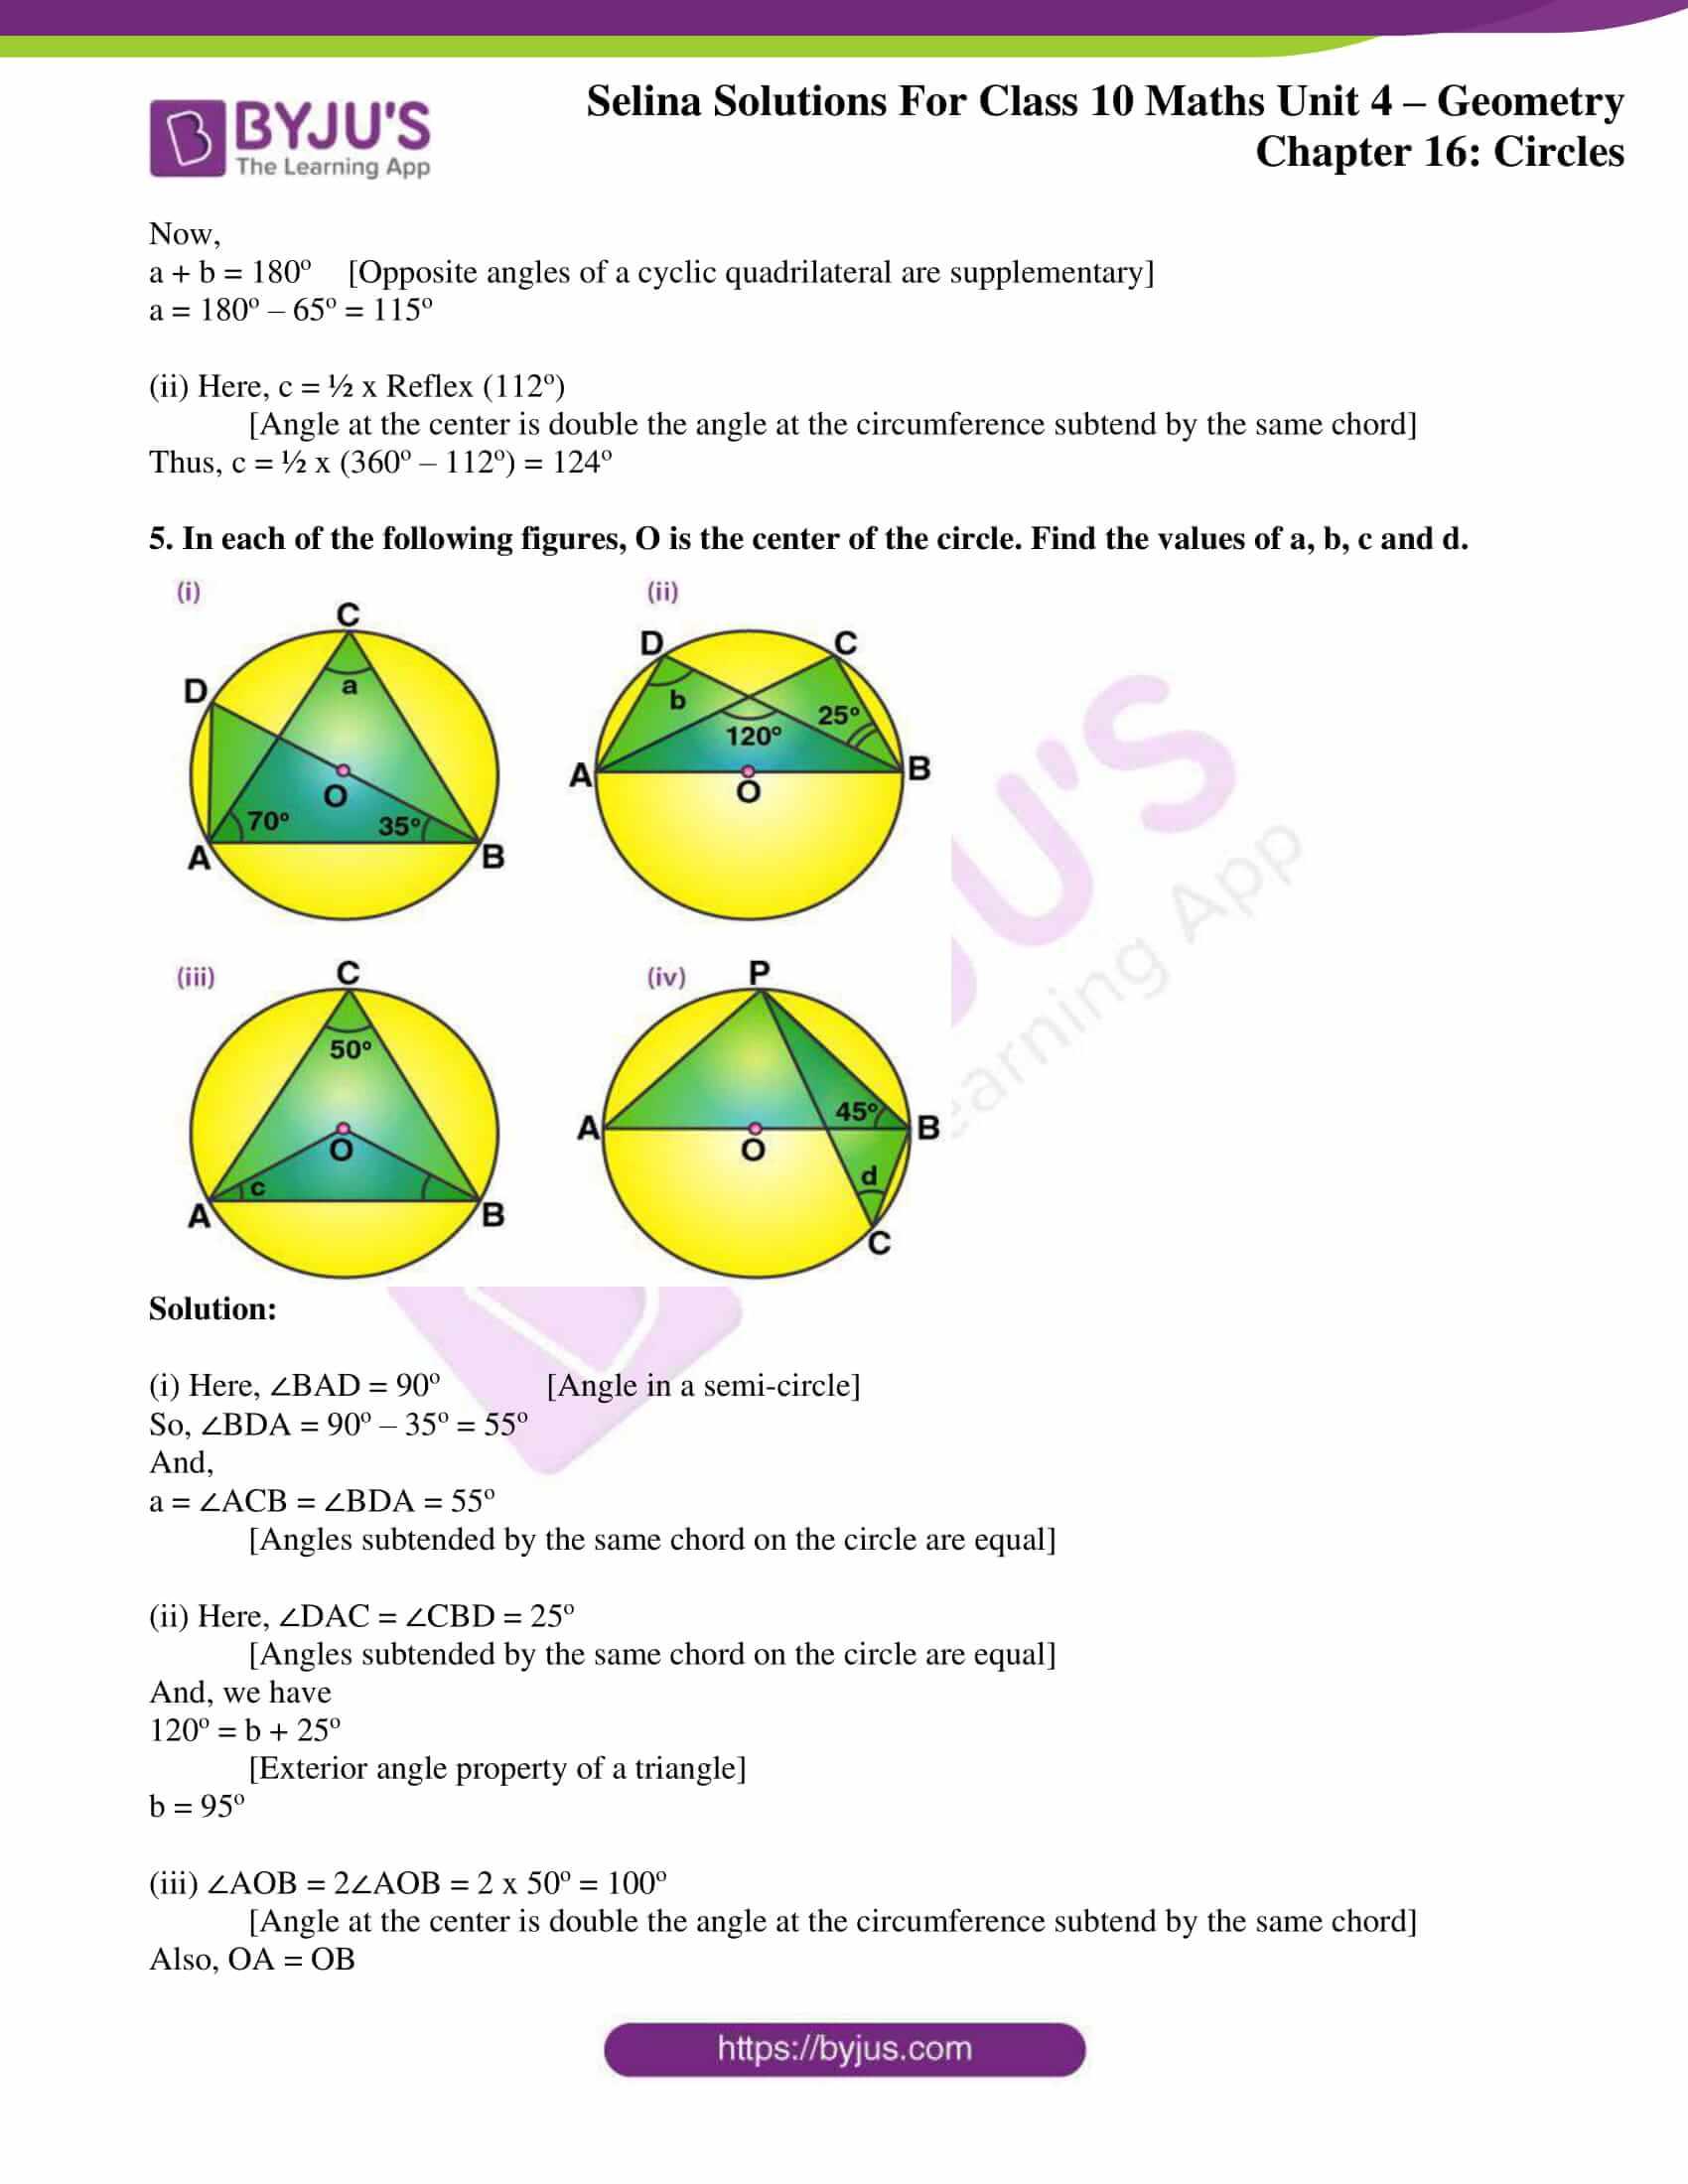 selina-sol-maths-class-10-ch-17-ex-a-03